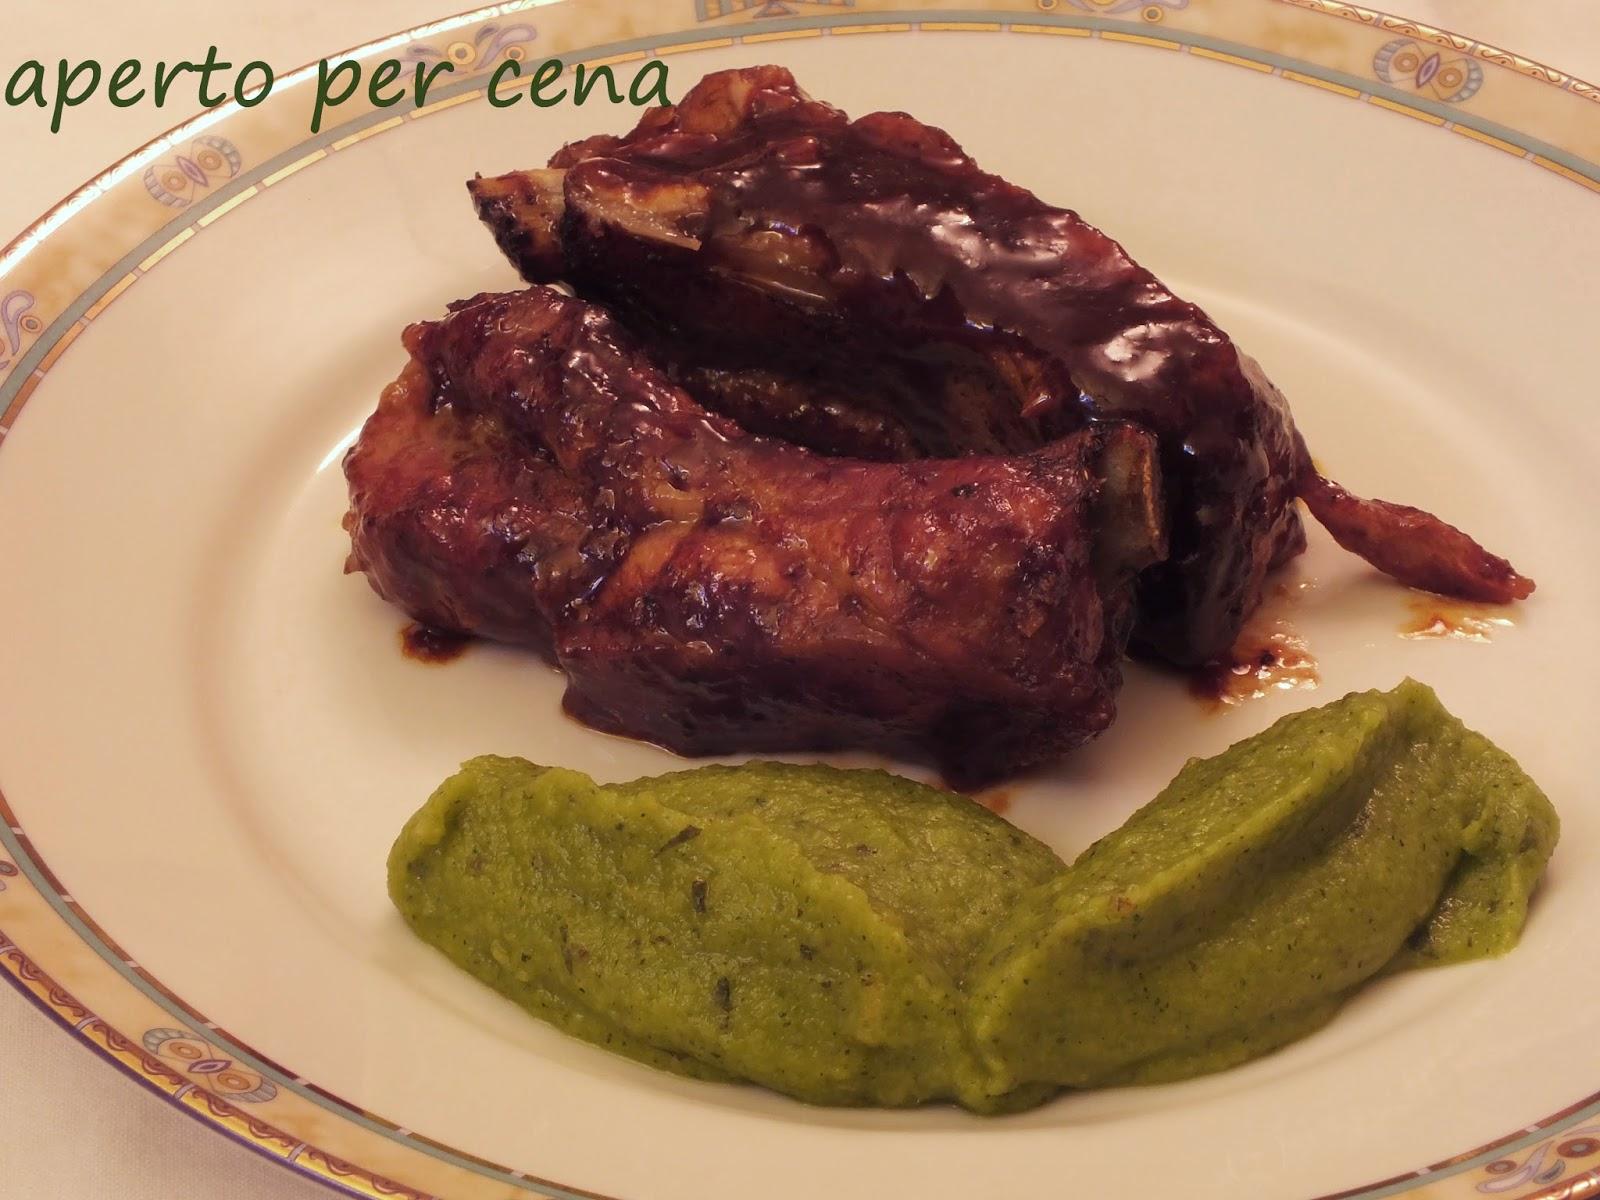 Aperto per cena costine di maiale glassate e purea di zucchine - Cosa cucino oggi a cena ...